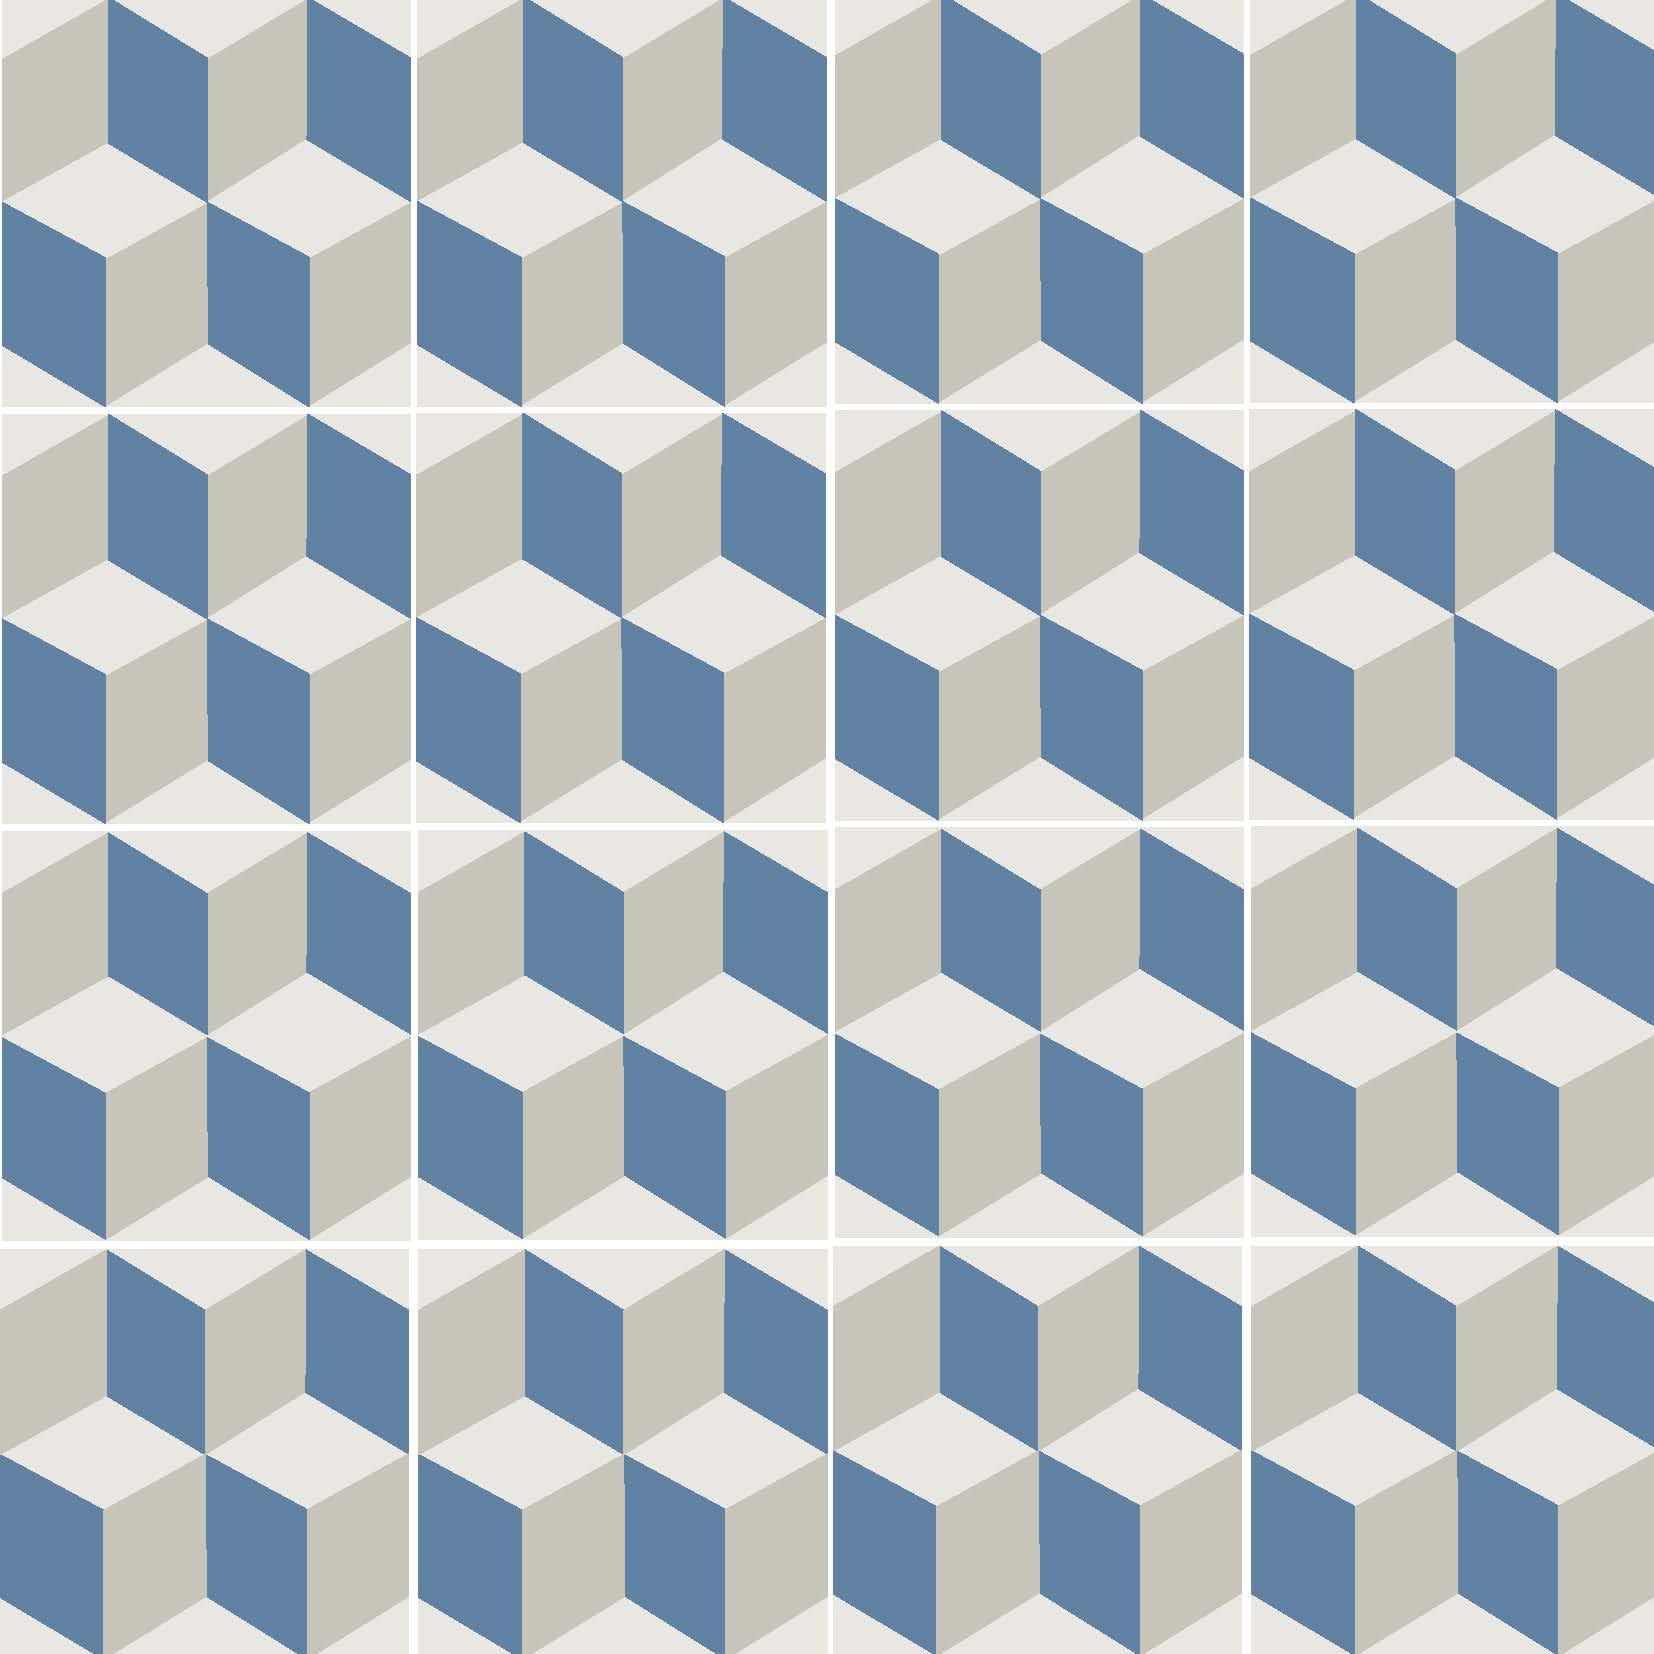 TROMPE L'OEIL- bleu foncÇ super blanc perle.jpg